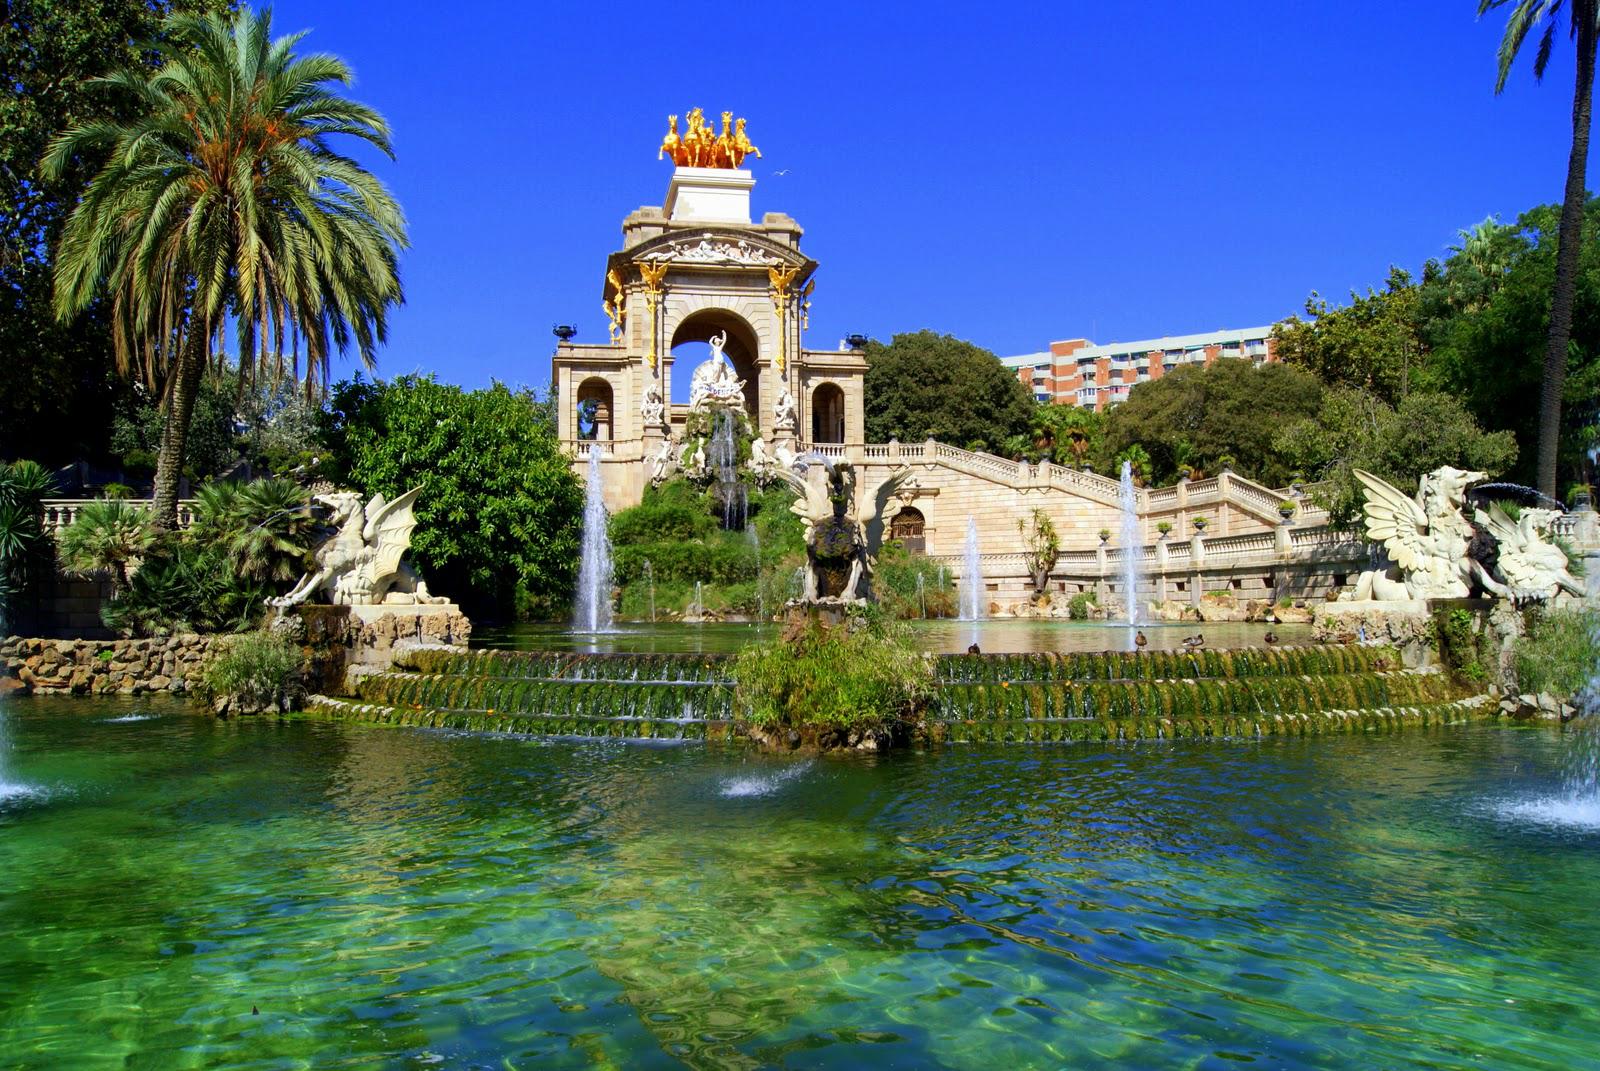 Top 6 Parks in Barcelona - Font de la Cascada in Parc de la Ciutadella